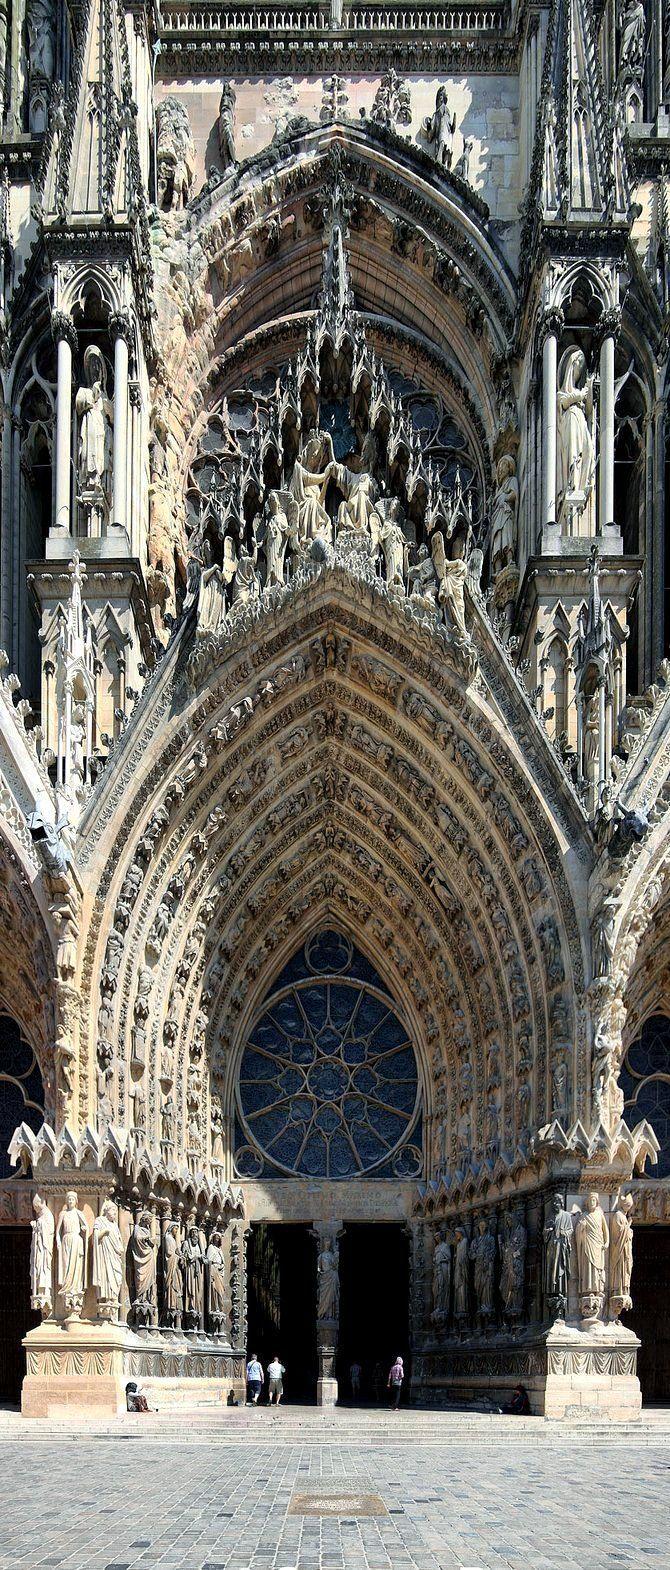 Cathédrale Notre-Dame de Reims, Champagne-Ardenne, France   Flickr - Photo by Batistini Gaston